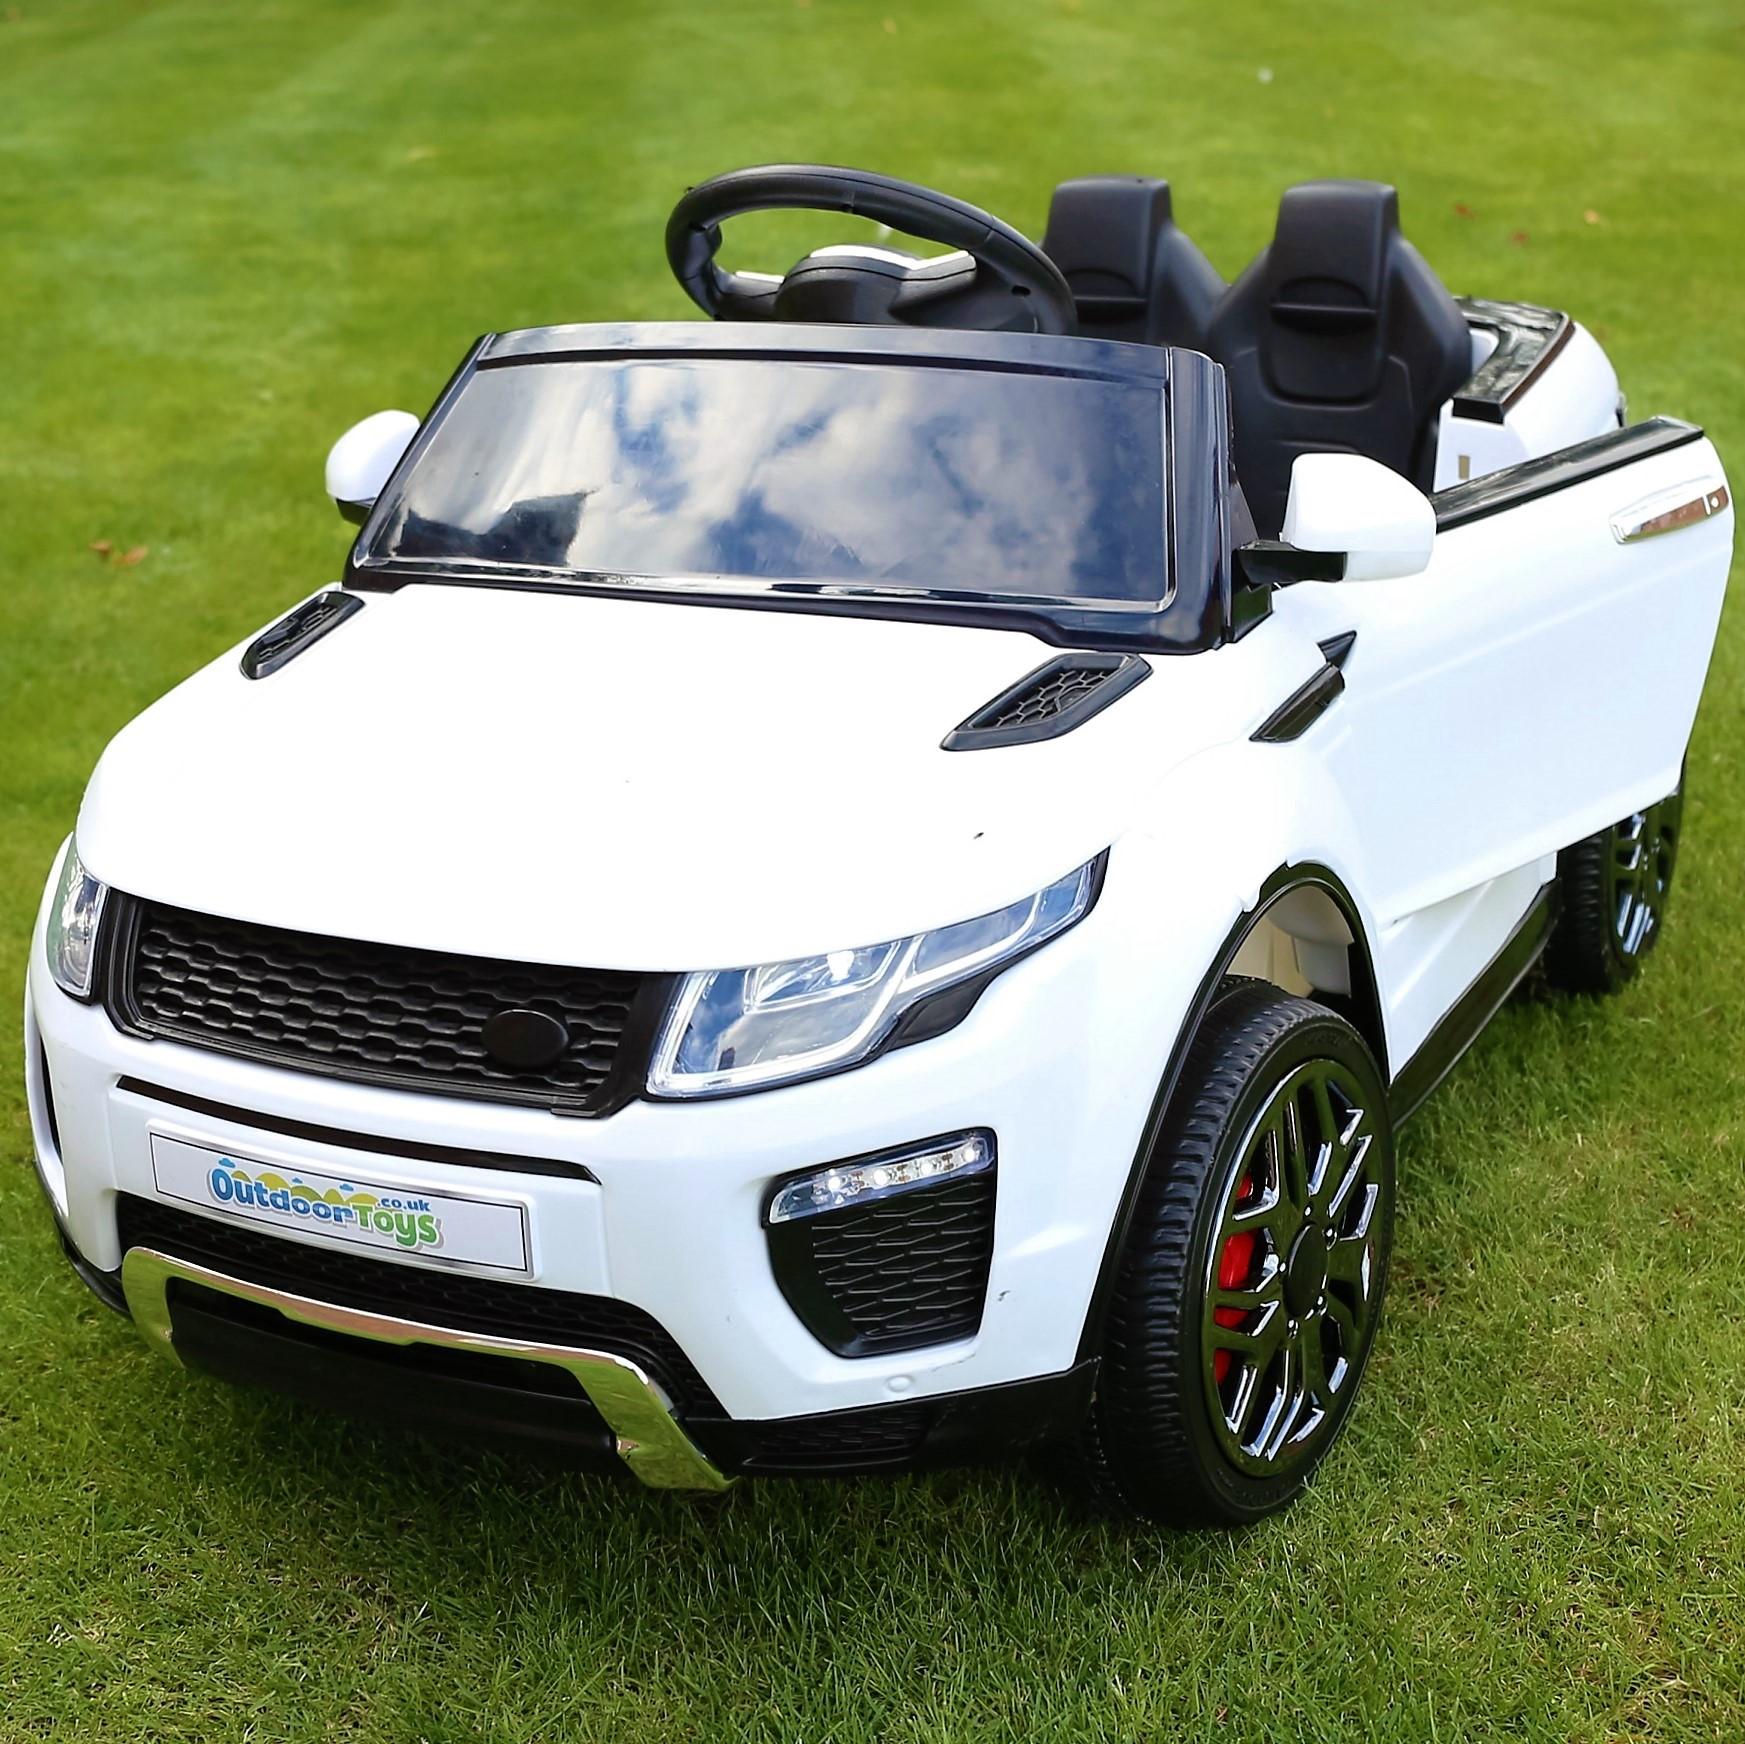 12v Range Rover Evoque Style Child S Ride On Car Jeep White